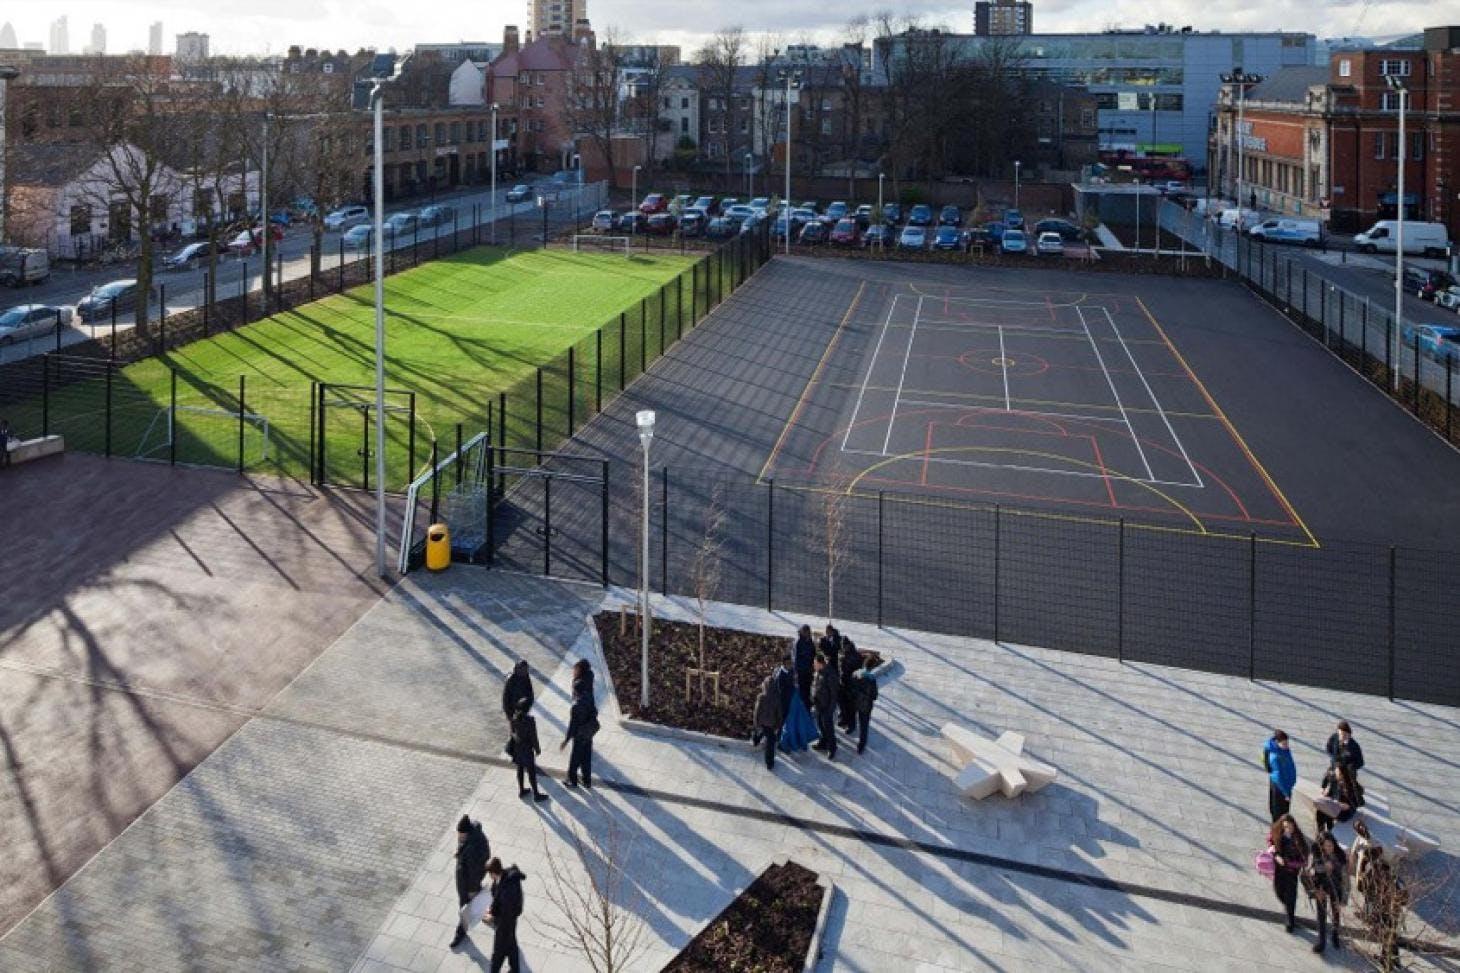 Urswick School 5 a side | 3G Astroturf football pitch